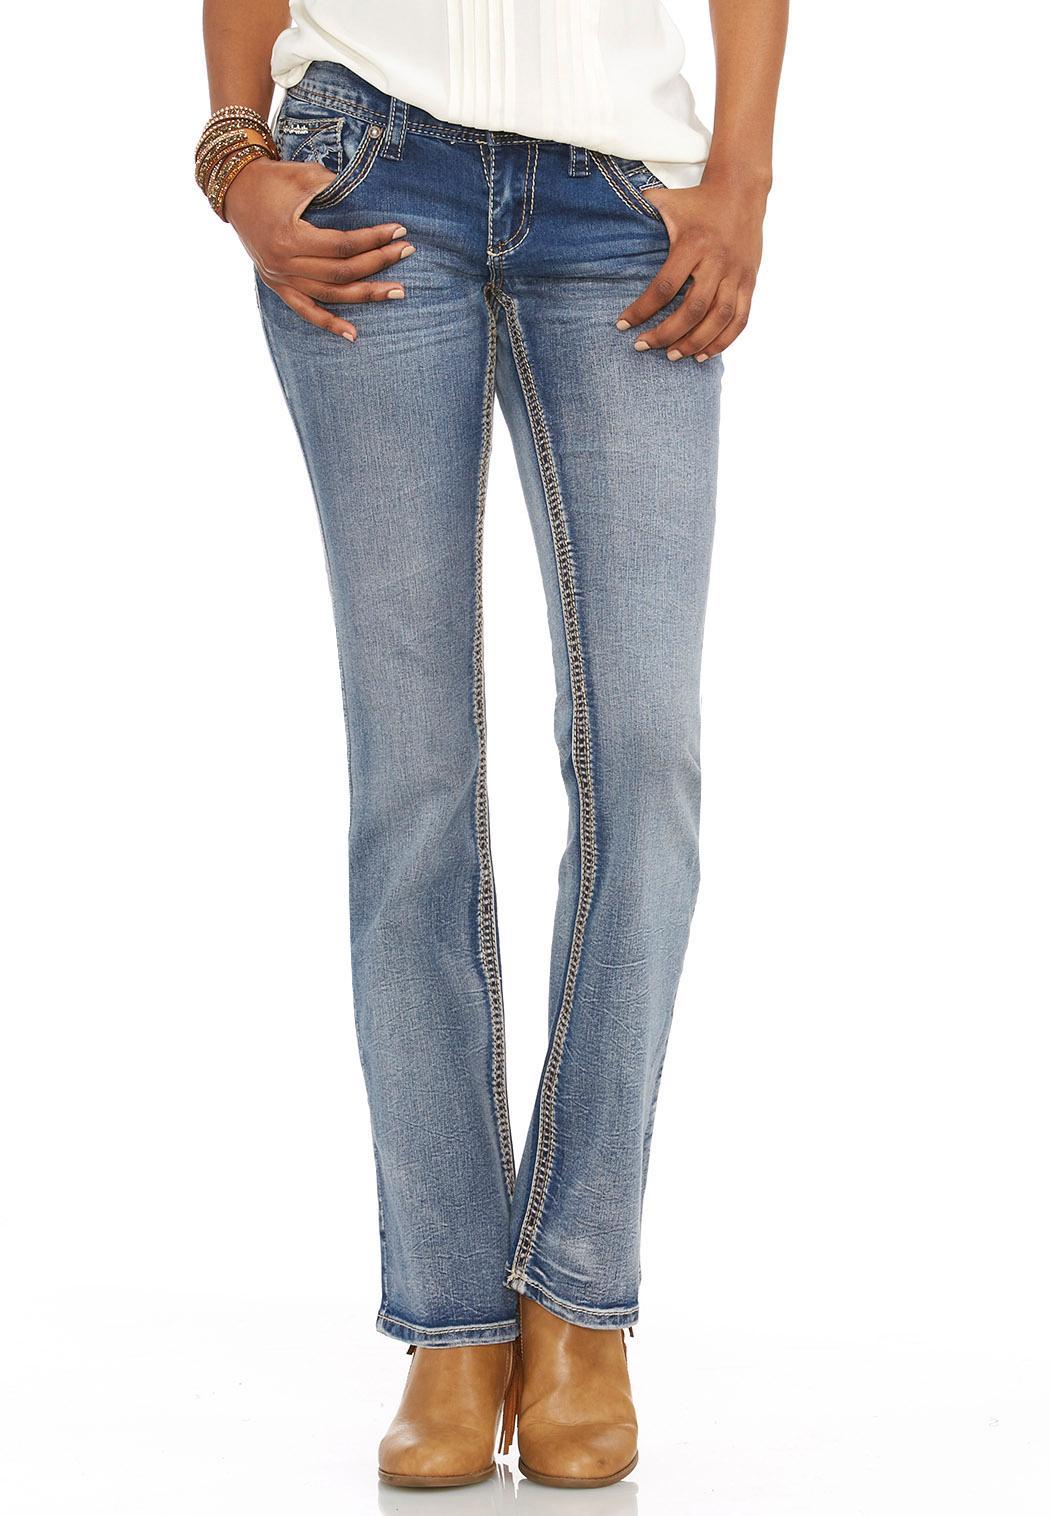 Plus Size Metallic Faux Leather Leggings - Black #